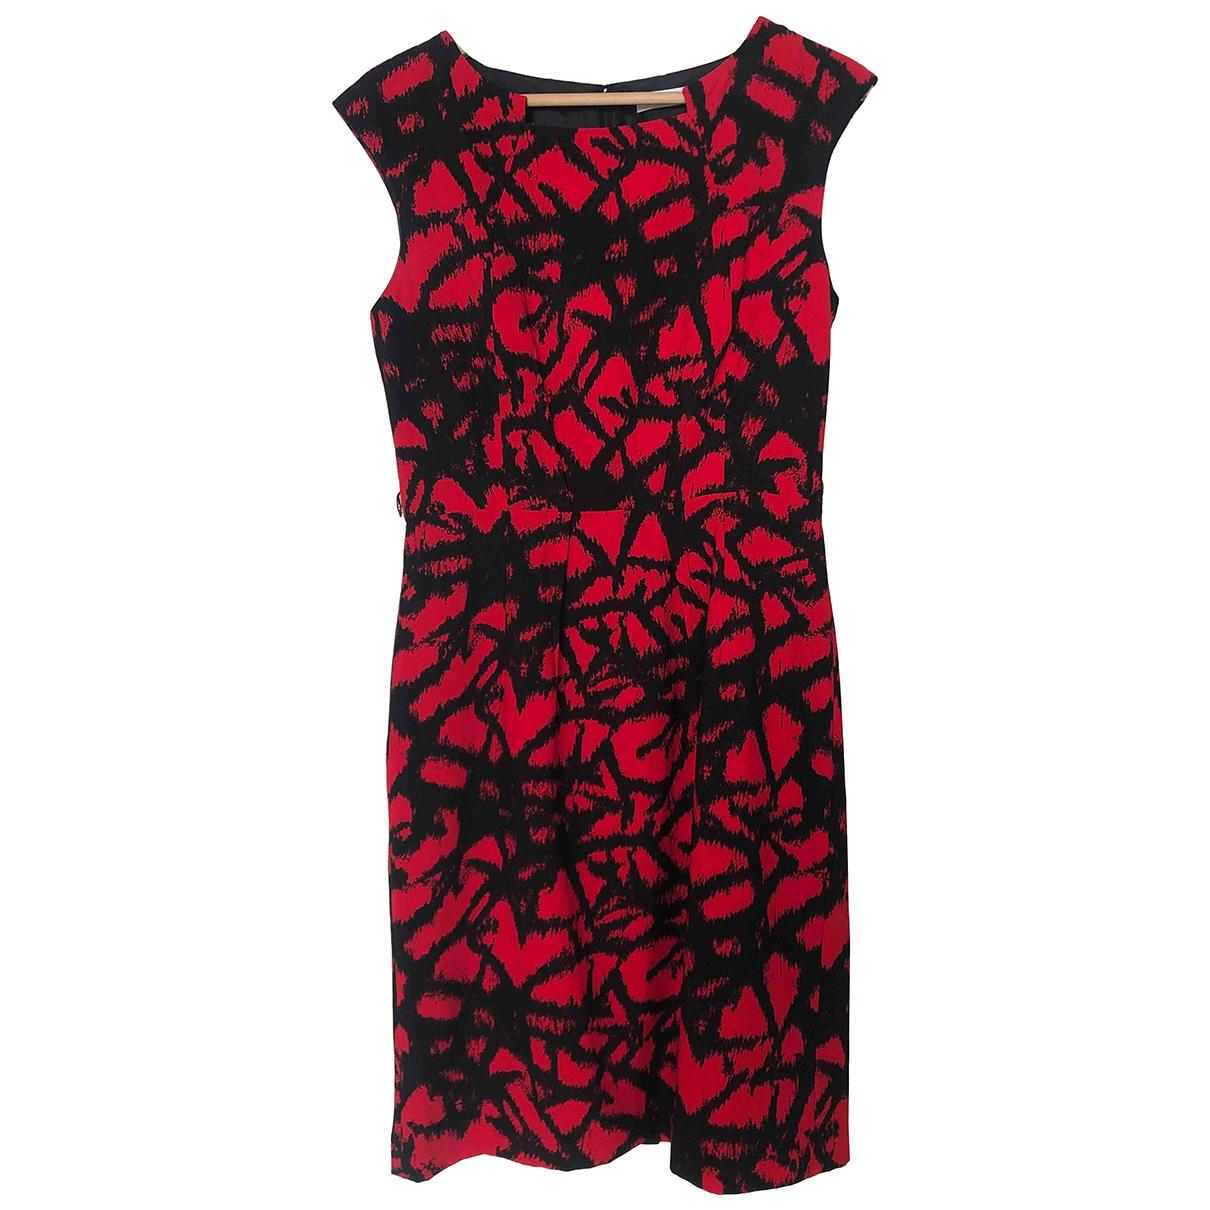 Calvin Klein \N Red dress for Women 8 US